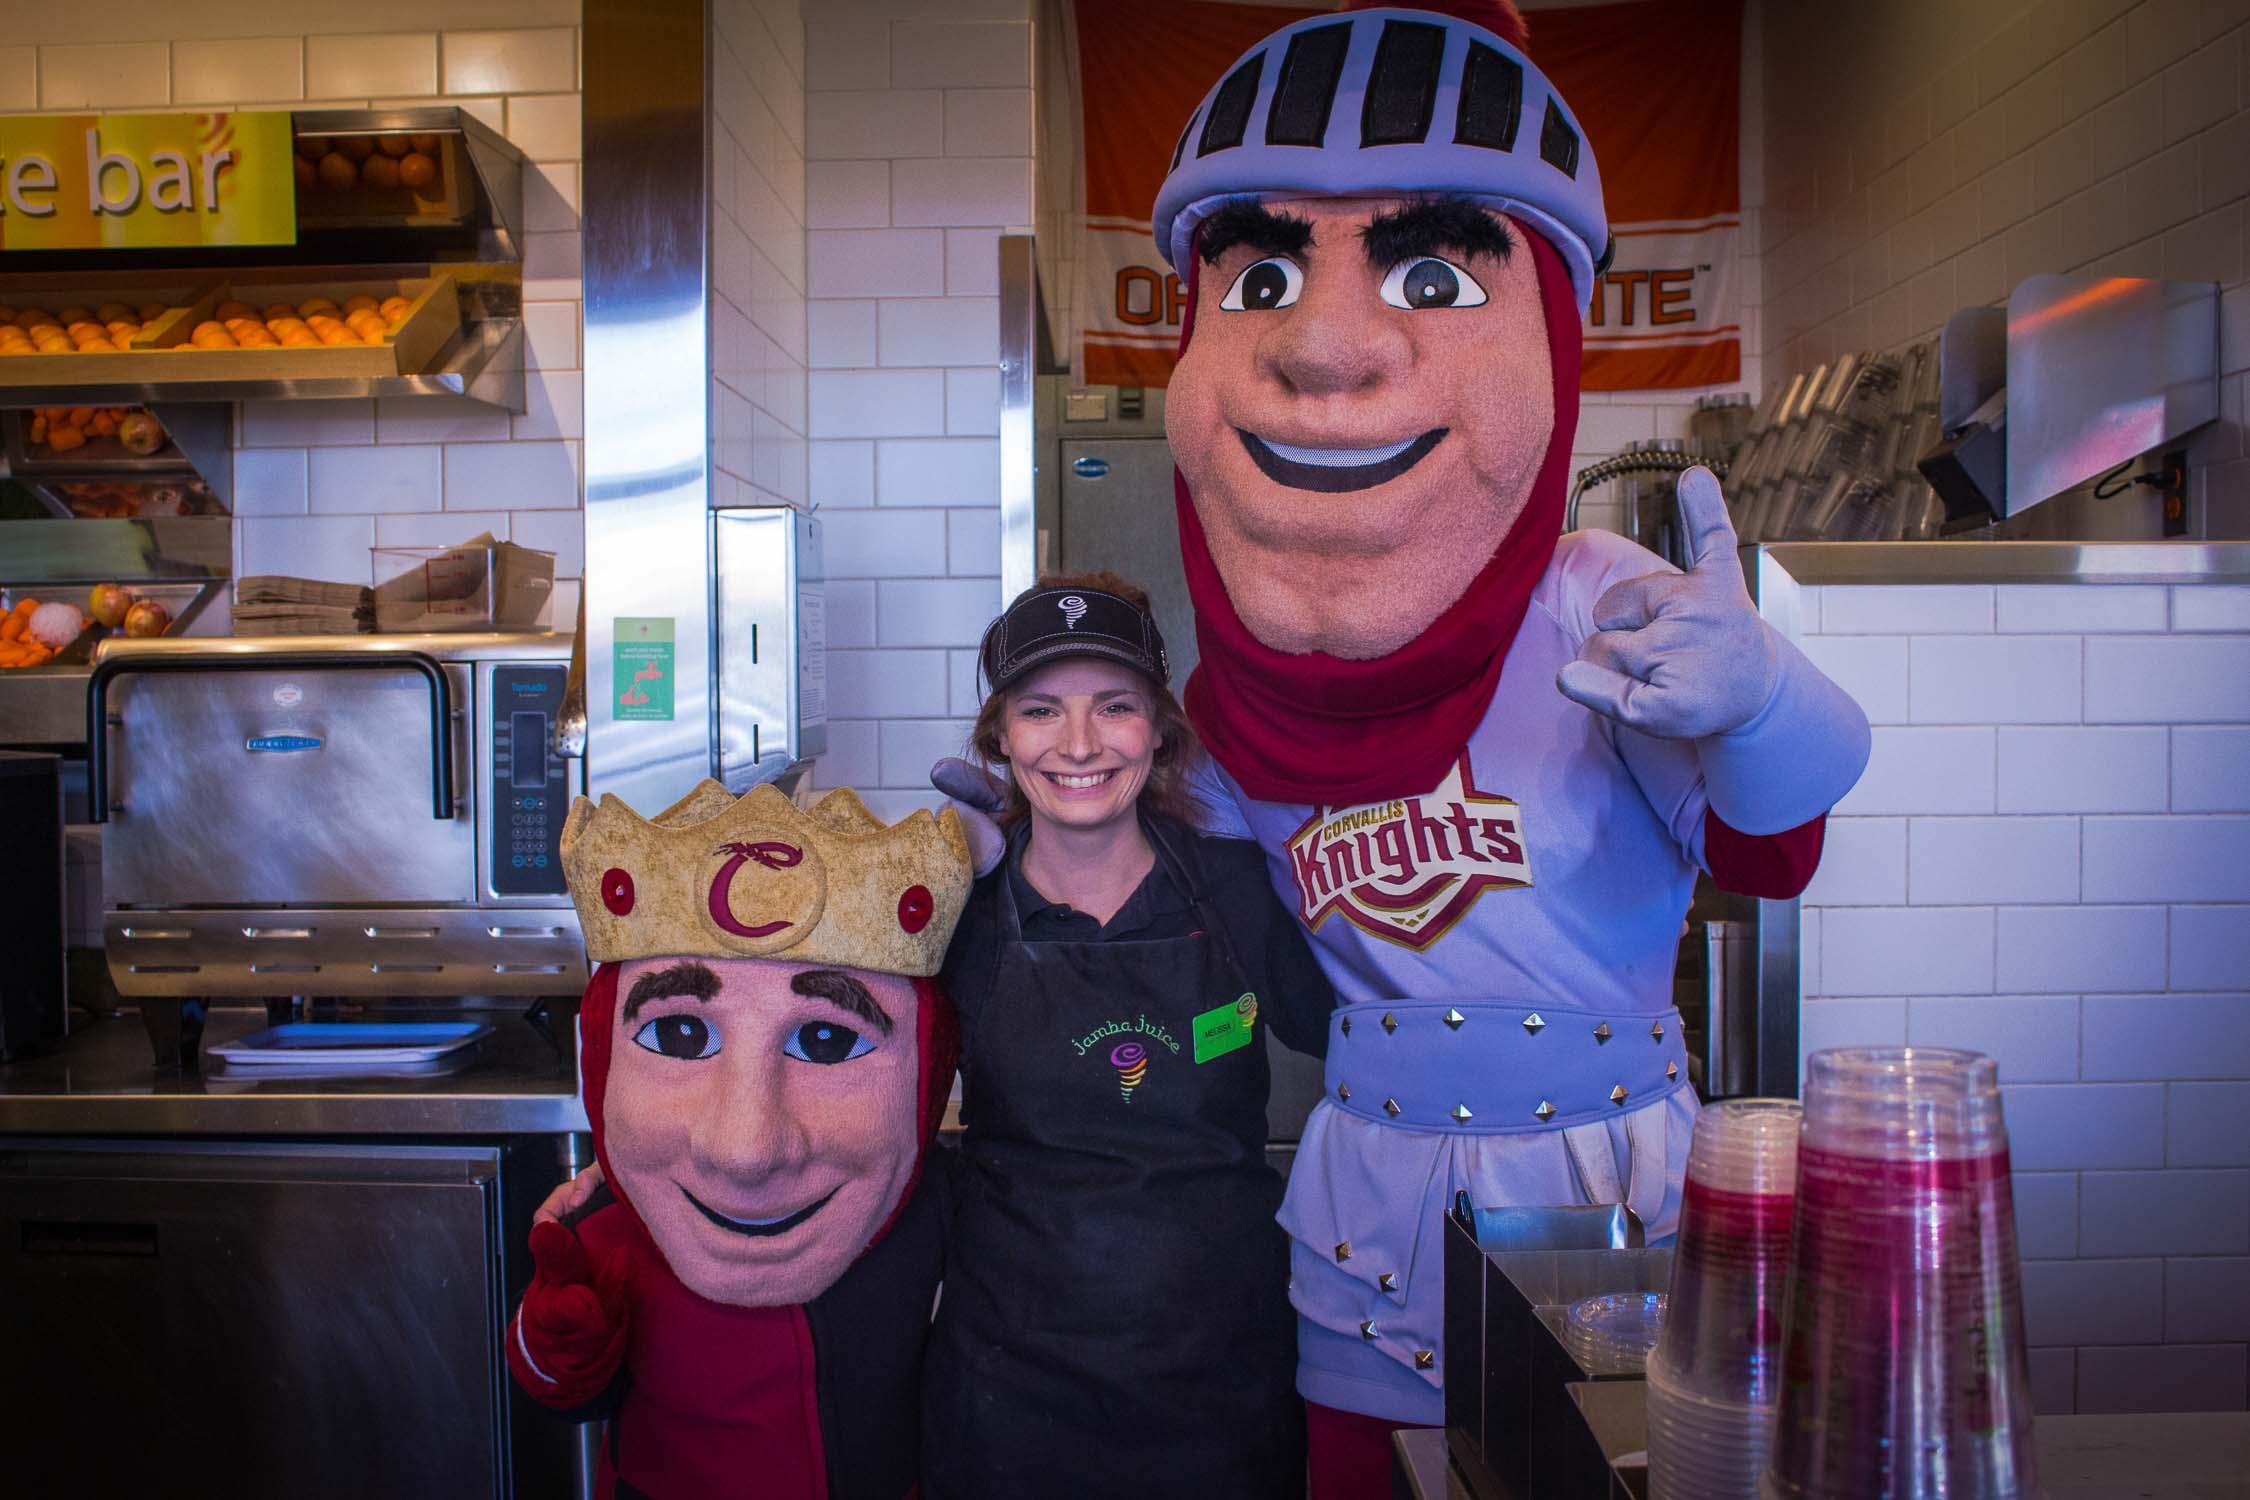 Corvallis Knights Mascots